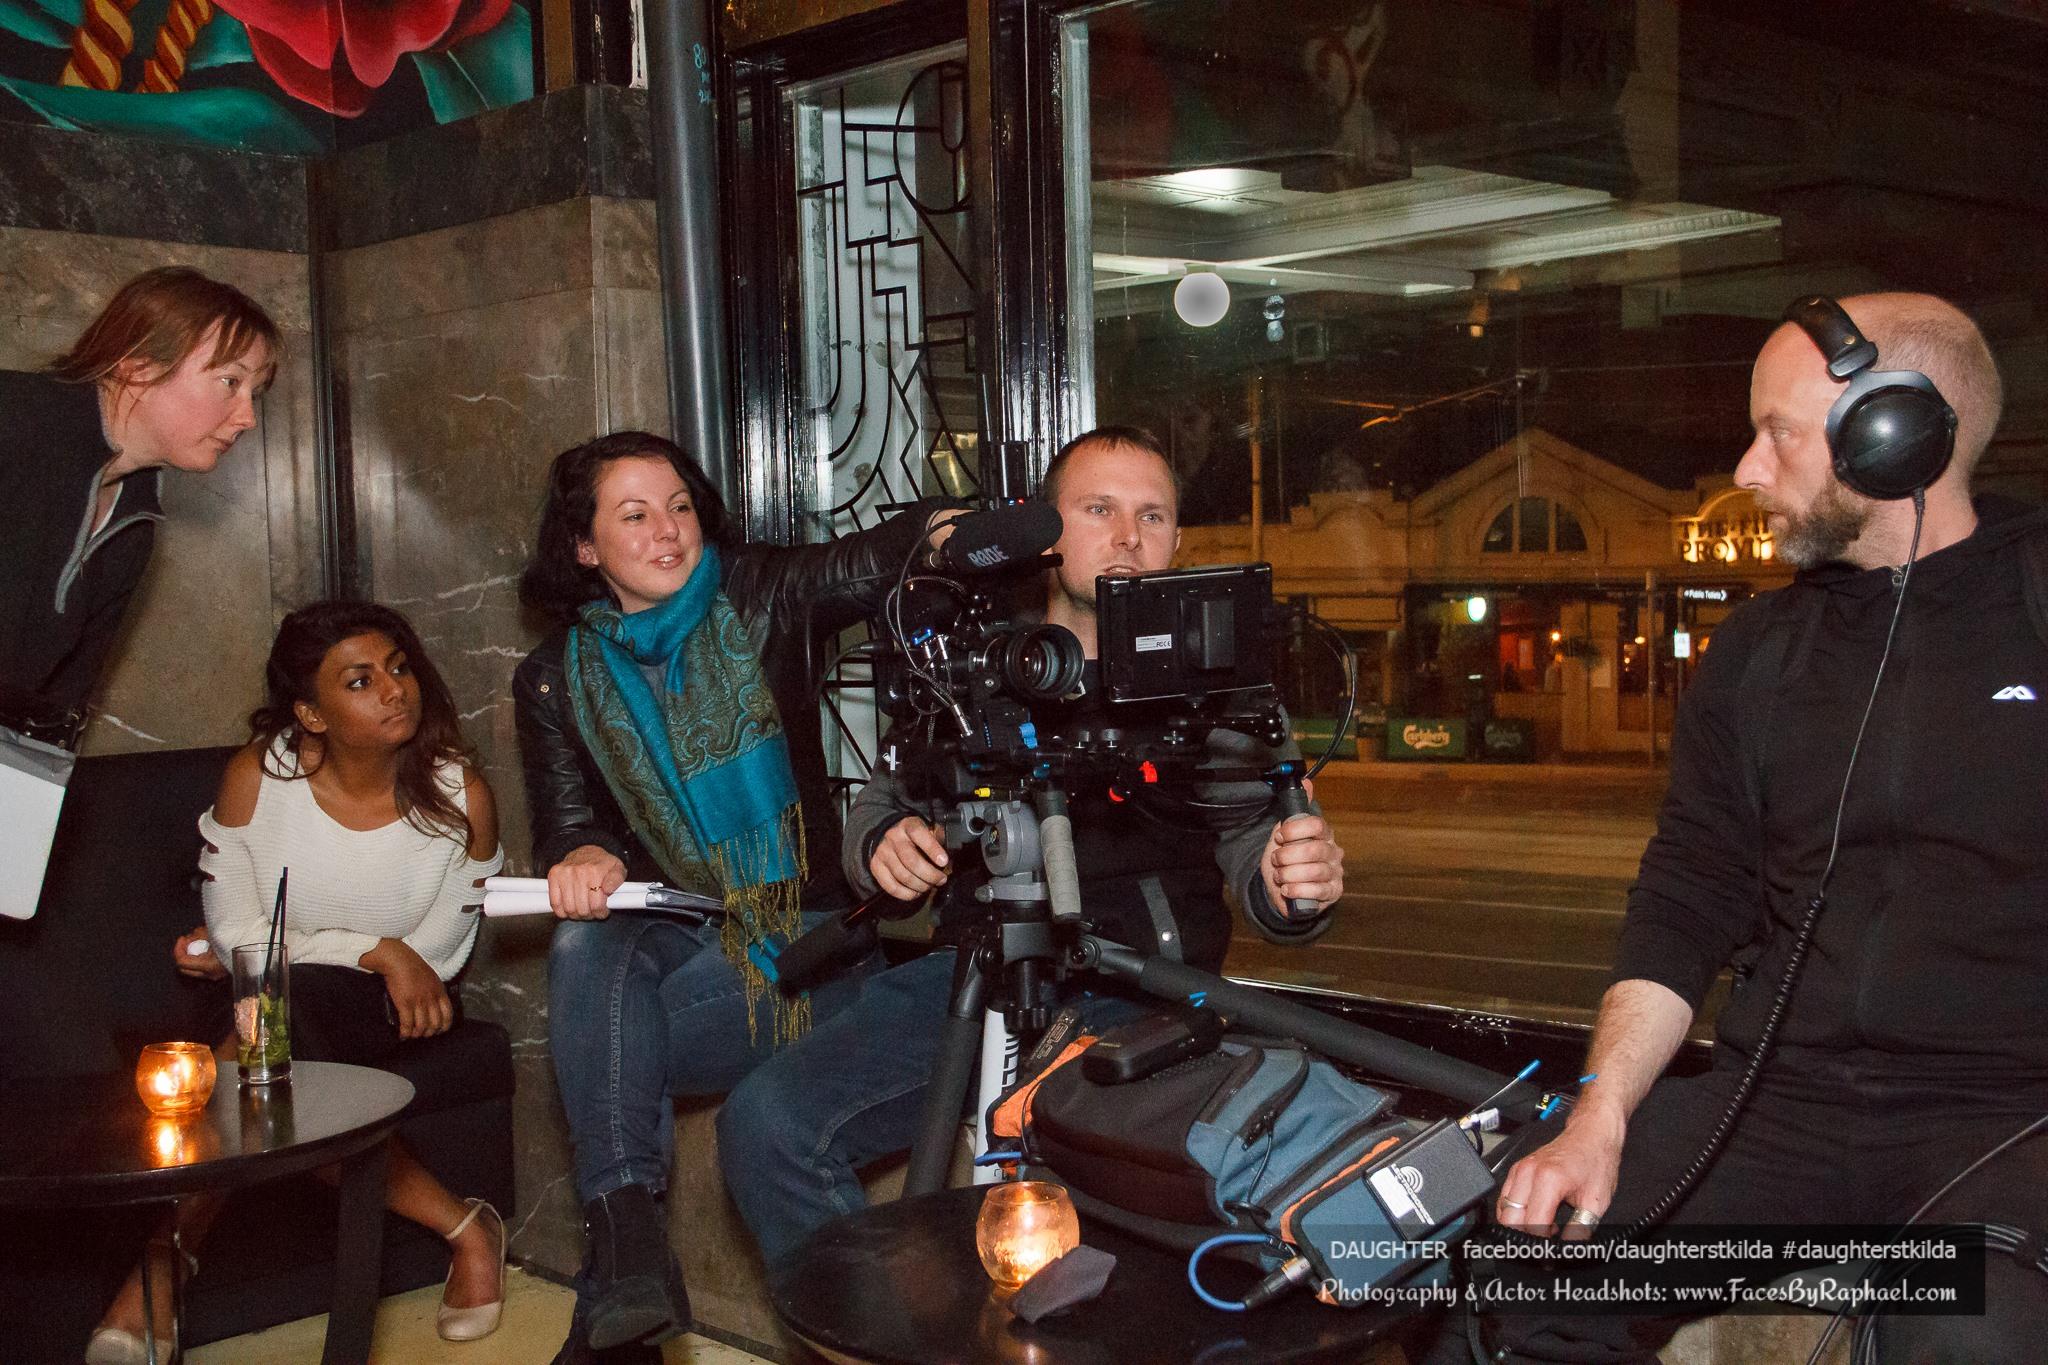 L-R - AD Jemma Van Loen, Co-Producer Dinushi Diaz, Director/Writer Sarah Jayne, DOP Stephan Ramplin, Location Sound Glenn Taylor